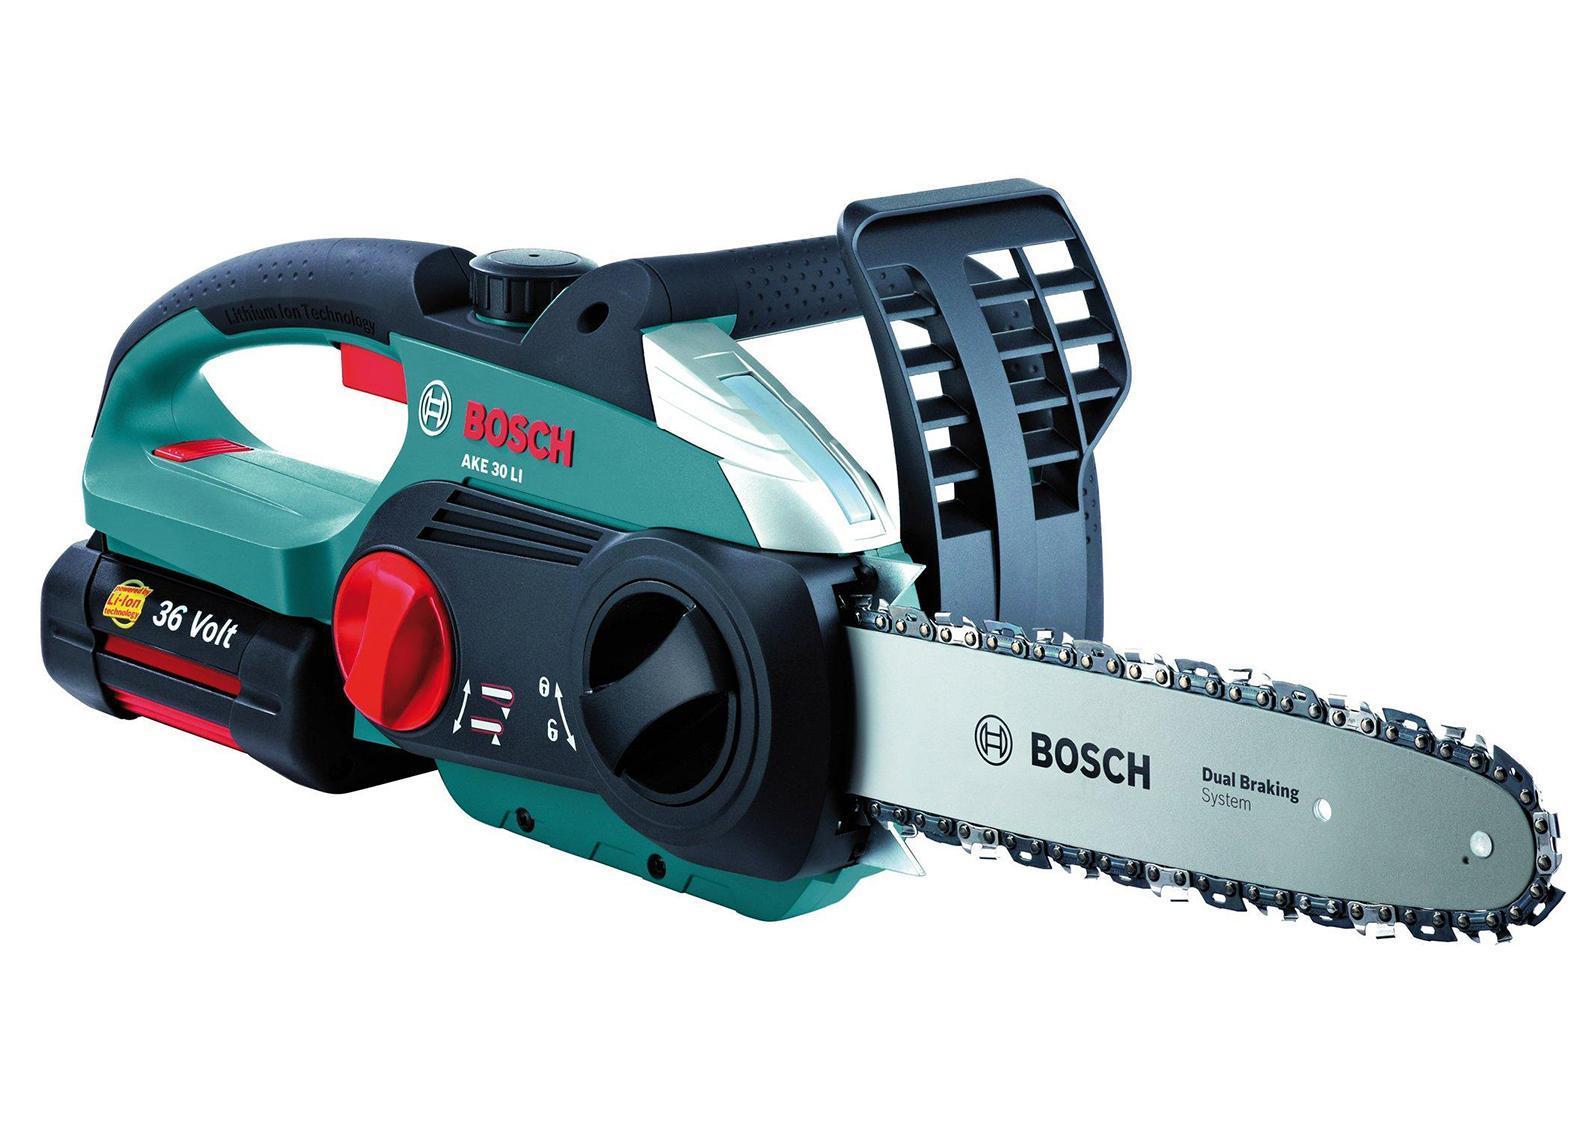 Цепная пила Bosch AKE 30 Li 0600837100AKE 30 LI